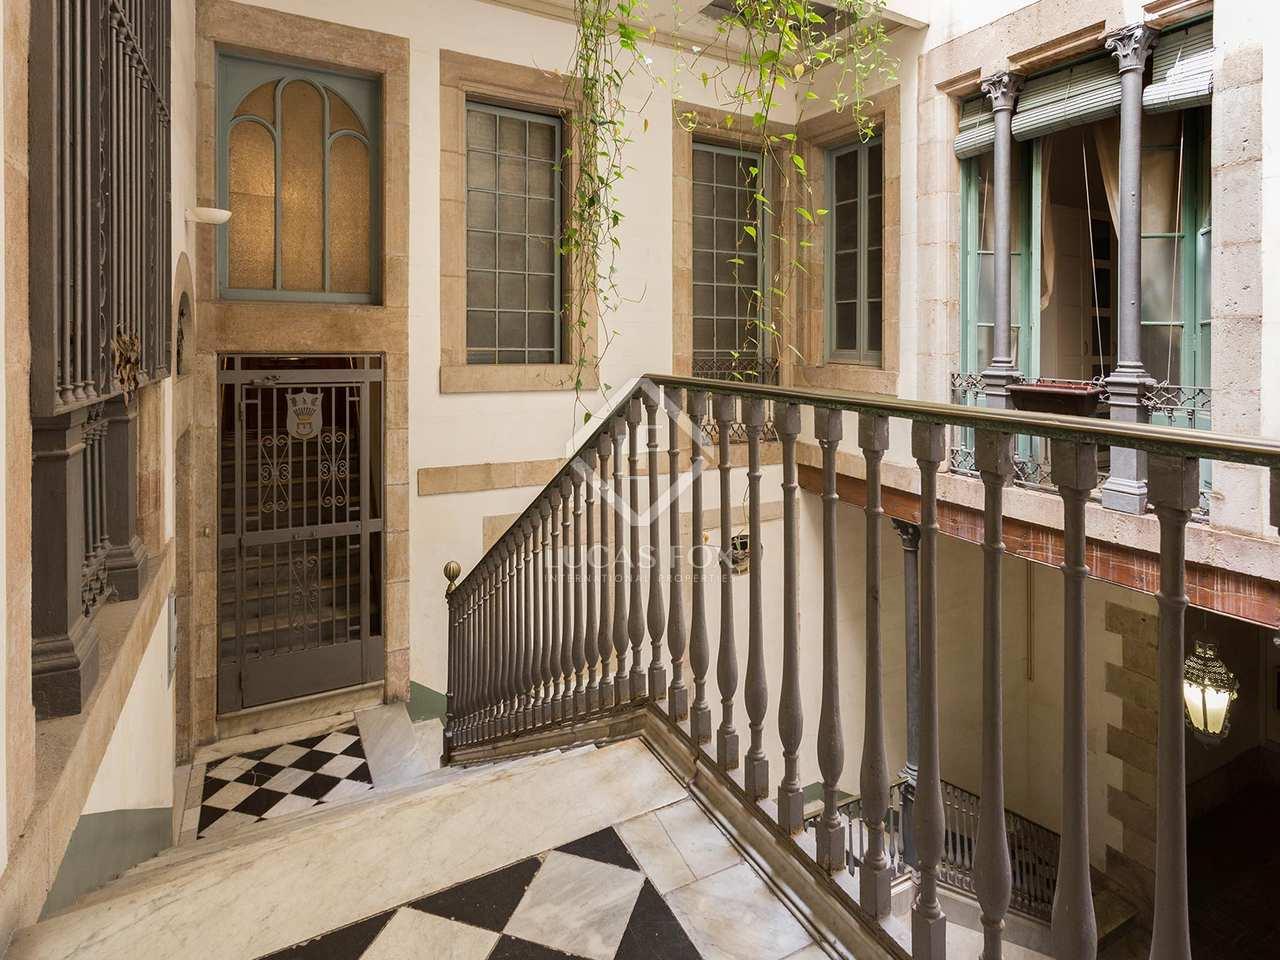 Appartement de 100m a vendre g tico barcelone for Appartement piscine barcelone